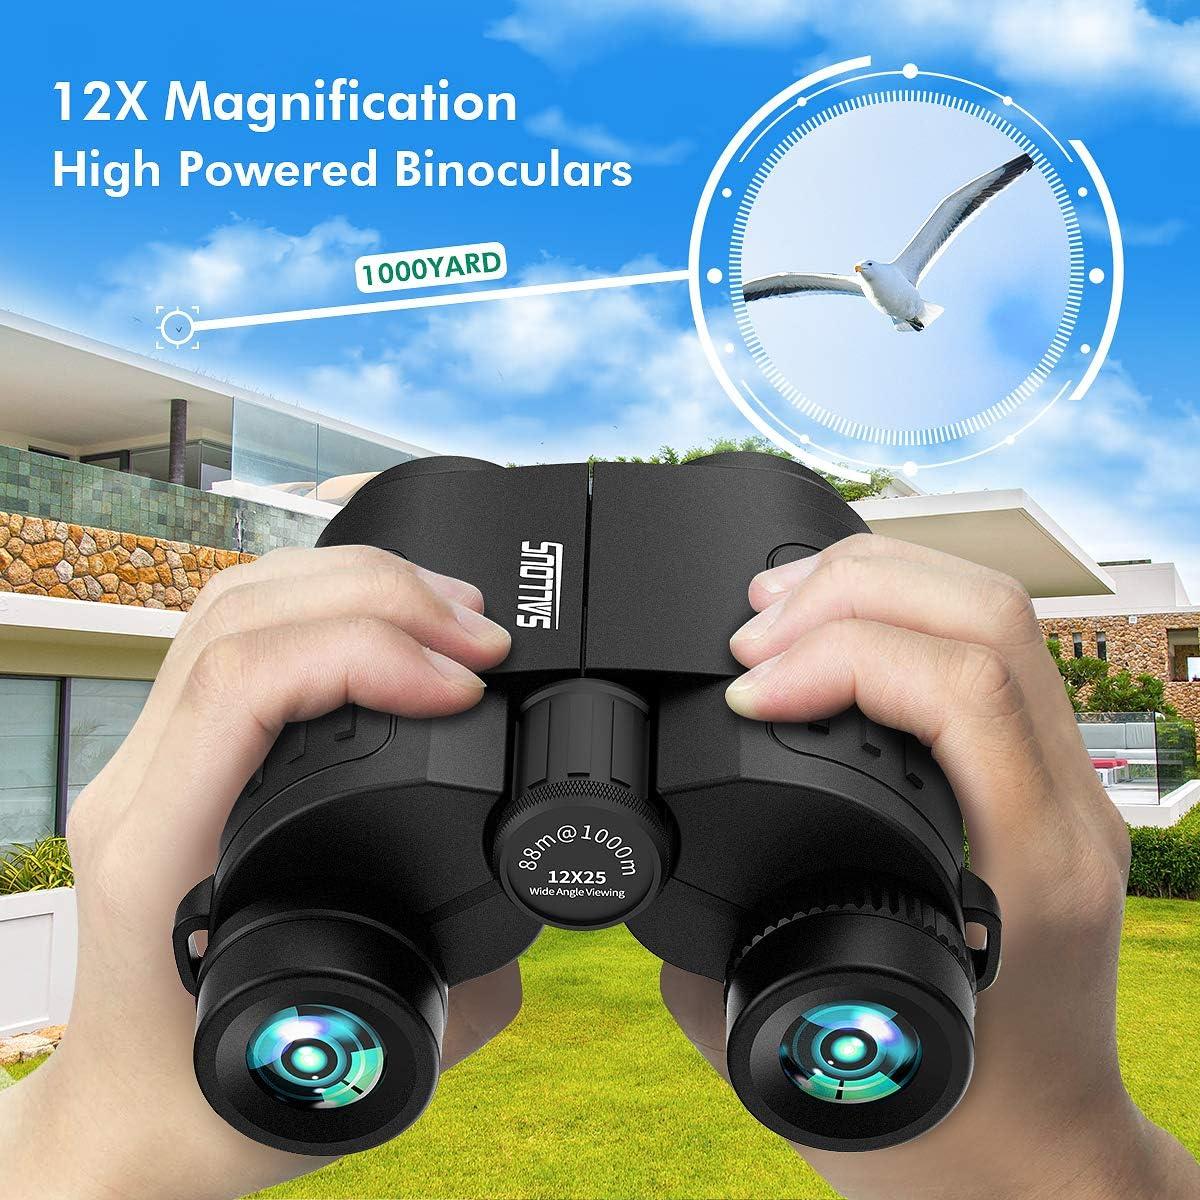 12X25 Compact Binoculars, Small Binoculars for Adults Kids, High Powered Lightweight Binoculars for Bird Watching, Easy Focus Folding Binocular for Traveling Hiking Wildlife Outdoor Concert